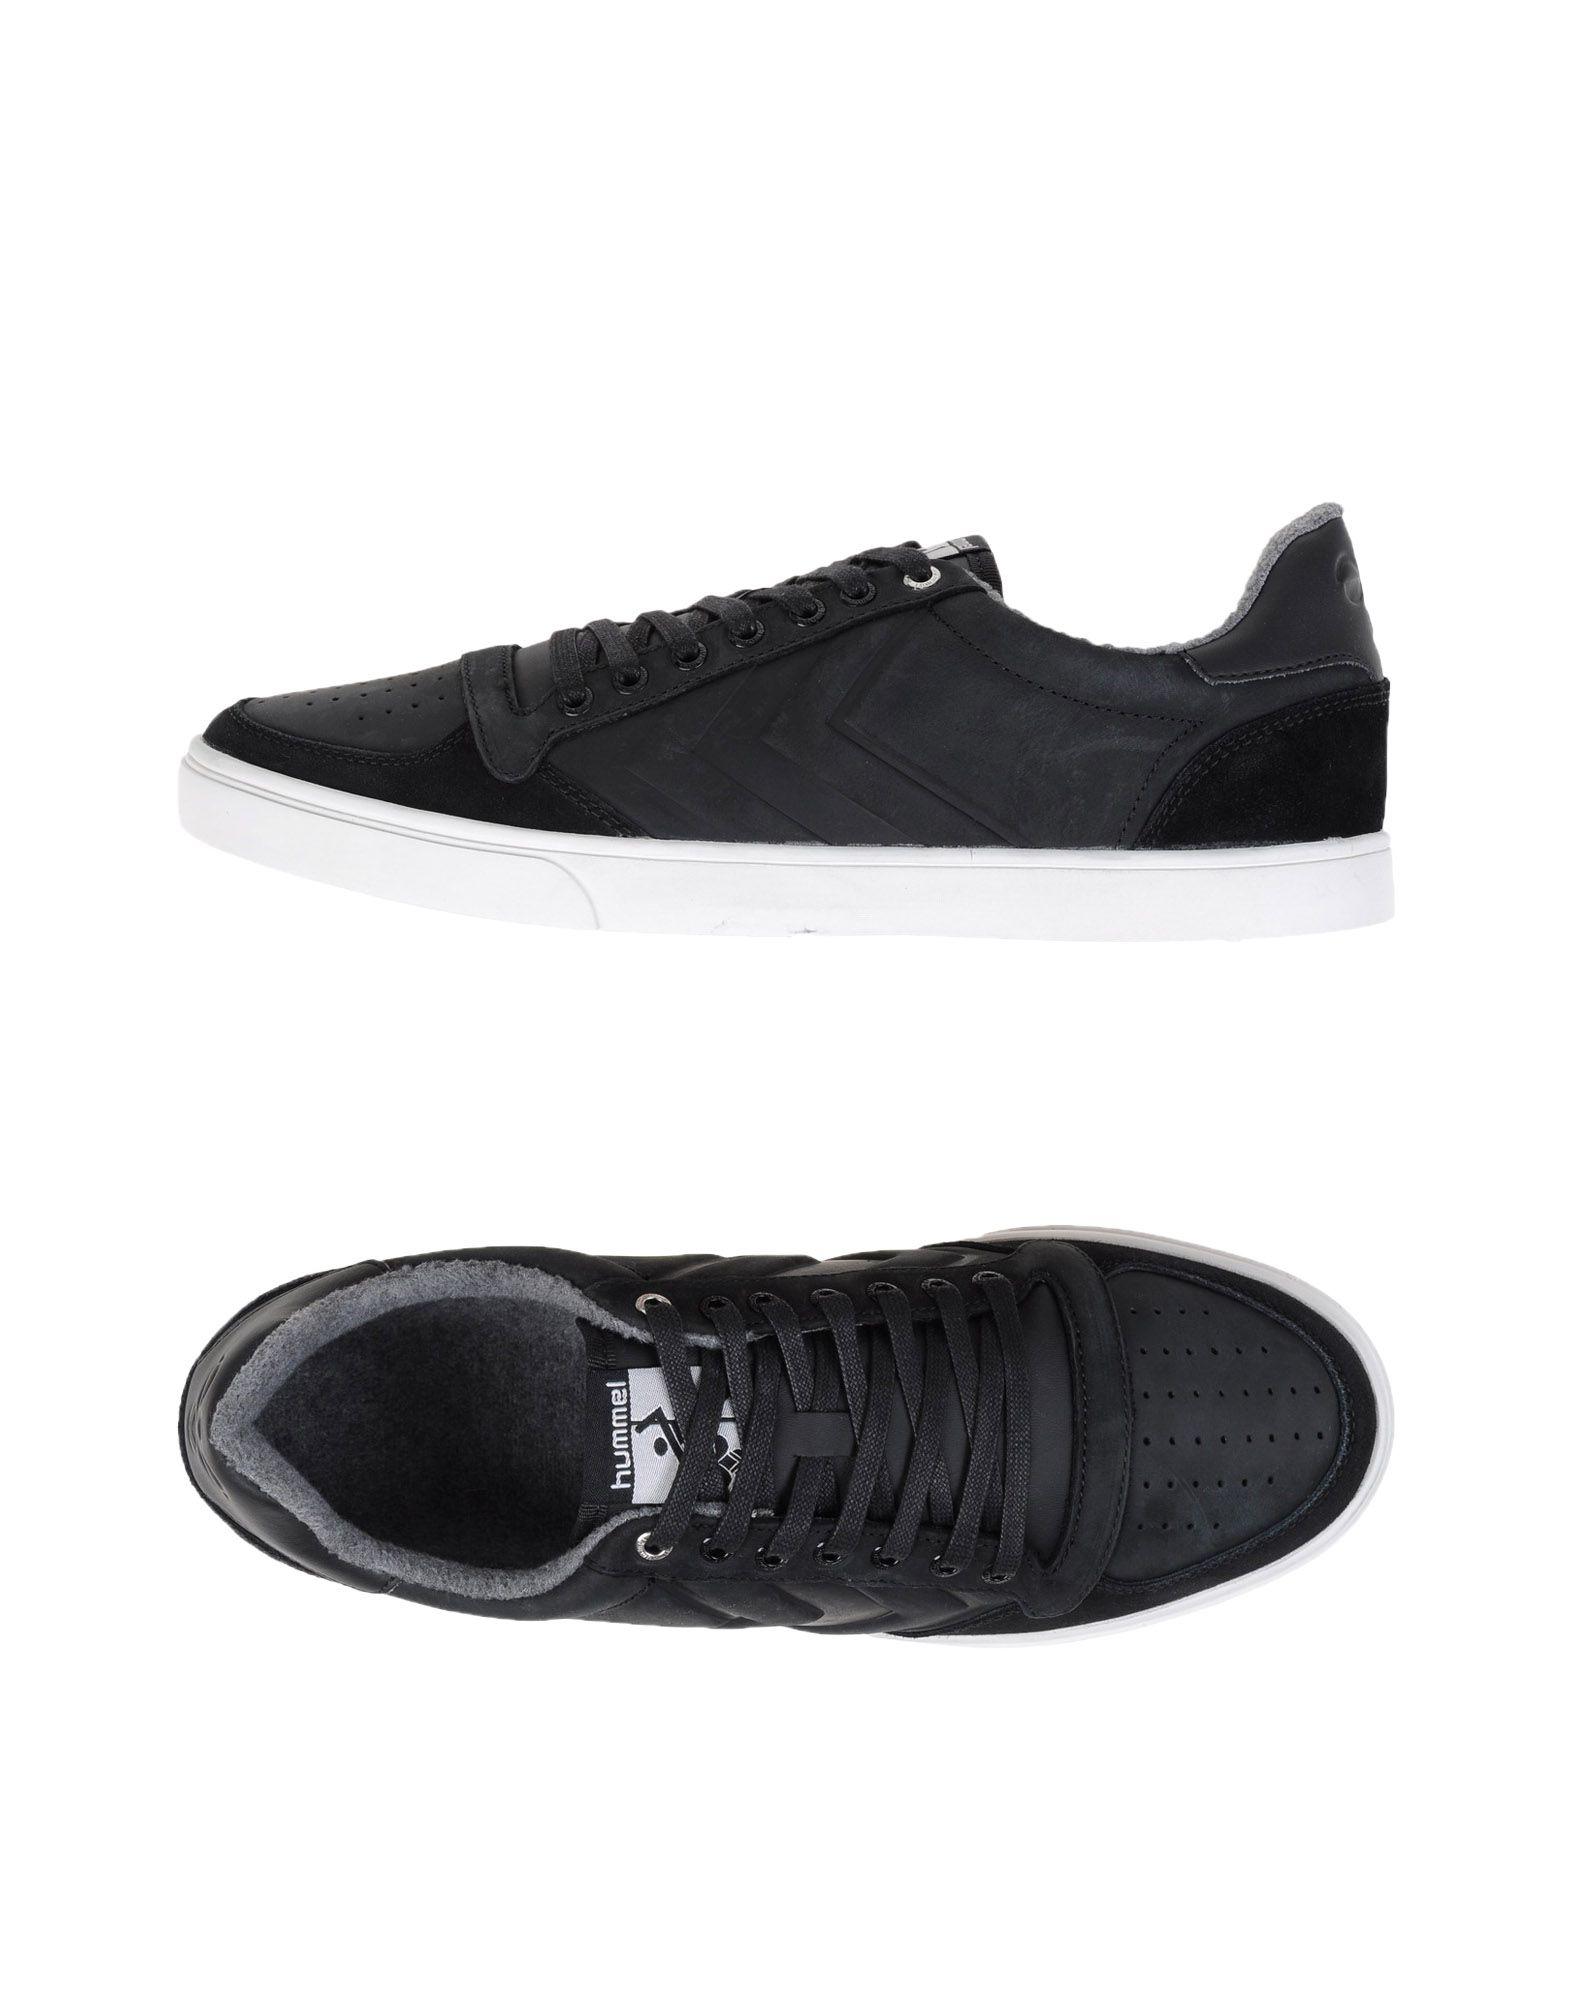 Sneakers Hummel Slimmer Stadil Mono Oiled Low - Uomo - 11110470VW